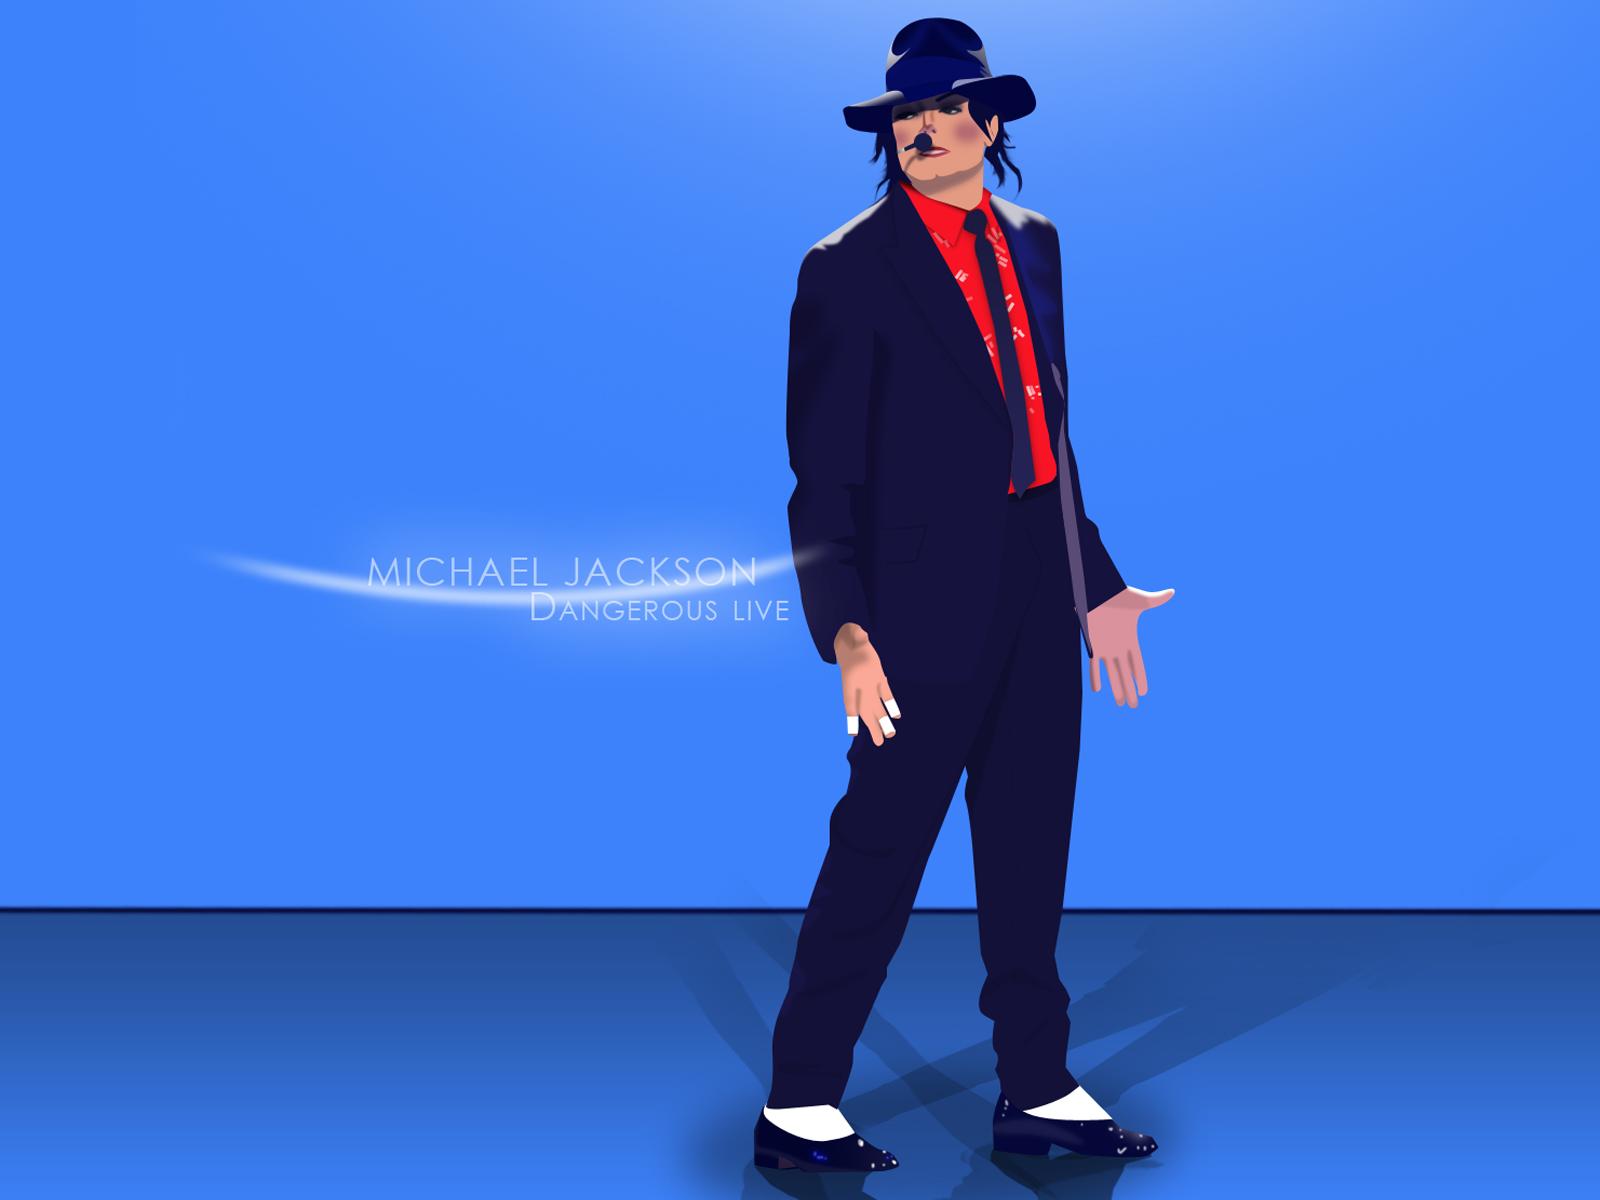 http://2.bp.blogspot.com/-e2AZA7Q5ekU/TzCy9SdyVuI/AAAAAAAAKmk/rHGwT5I4fFk/s1600/Michael+Jackson+HD+Wallpaper9.jpg